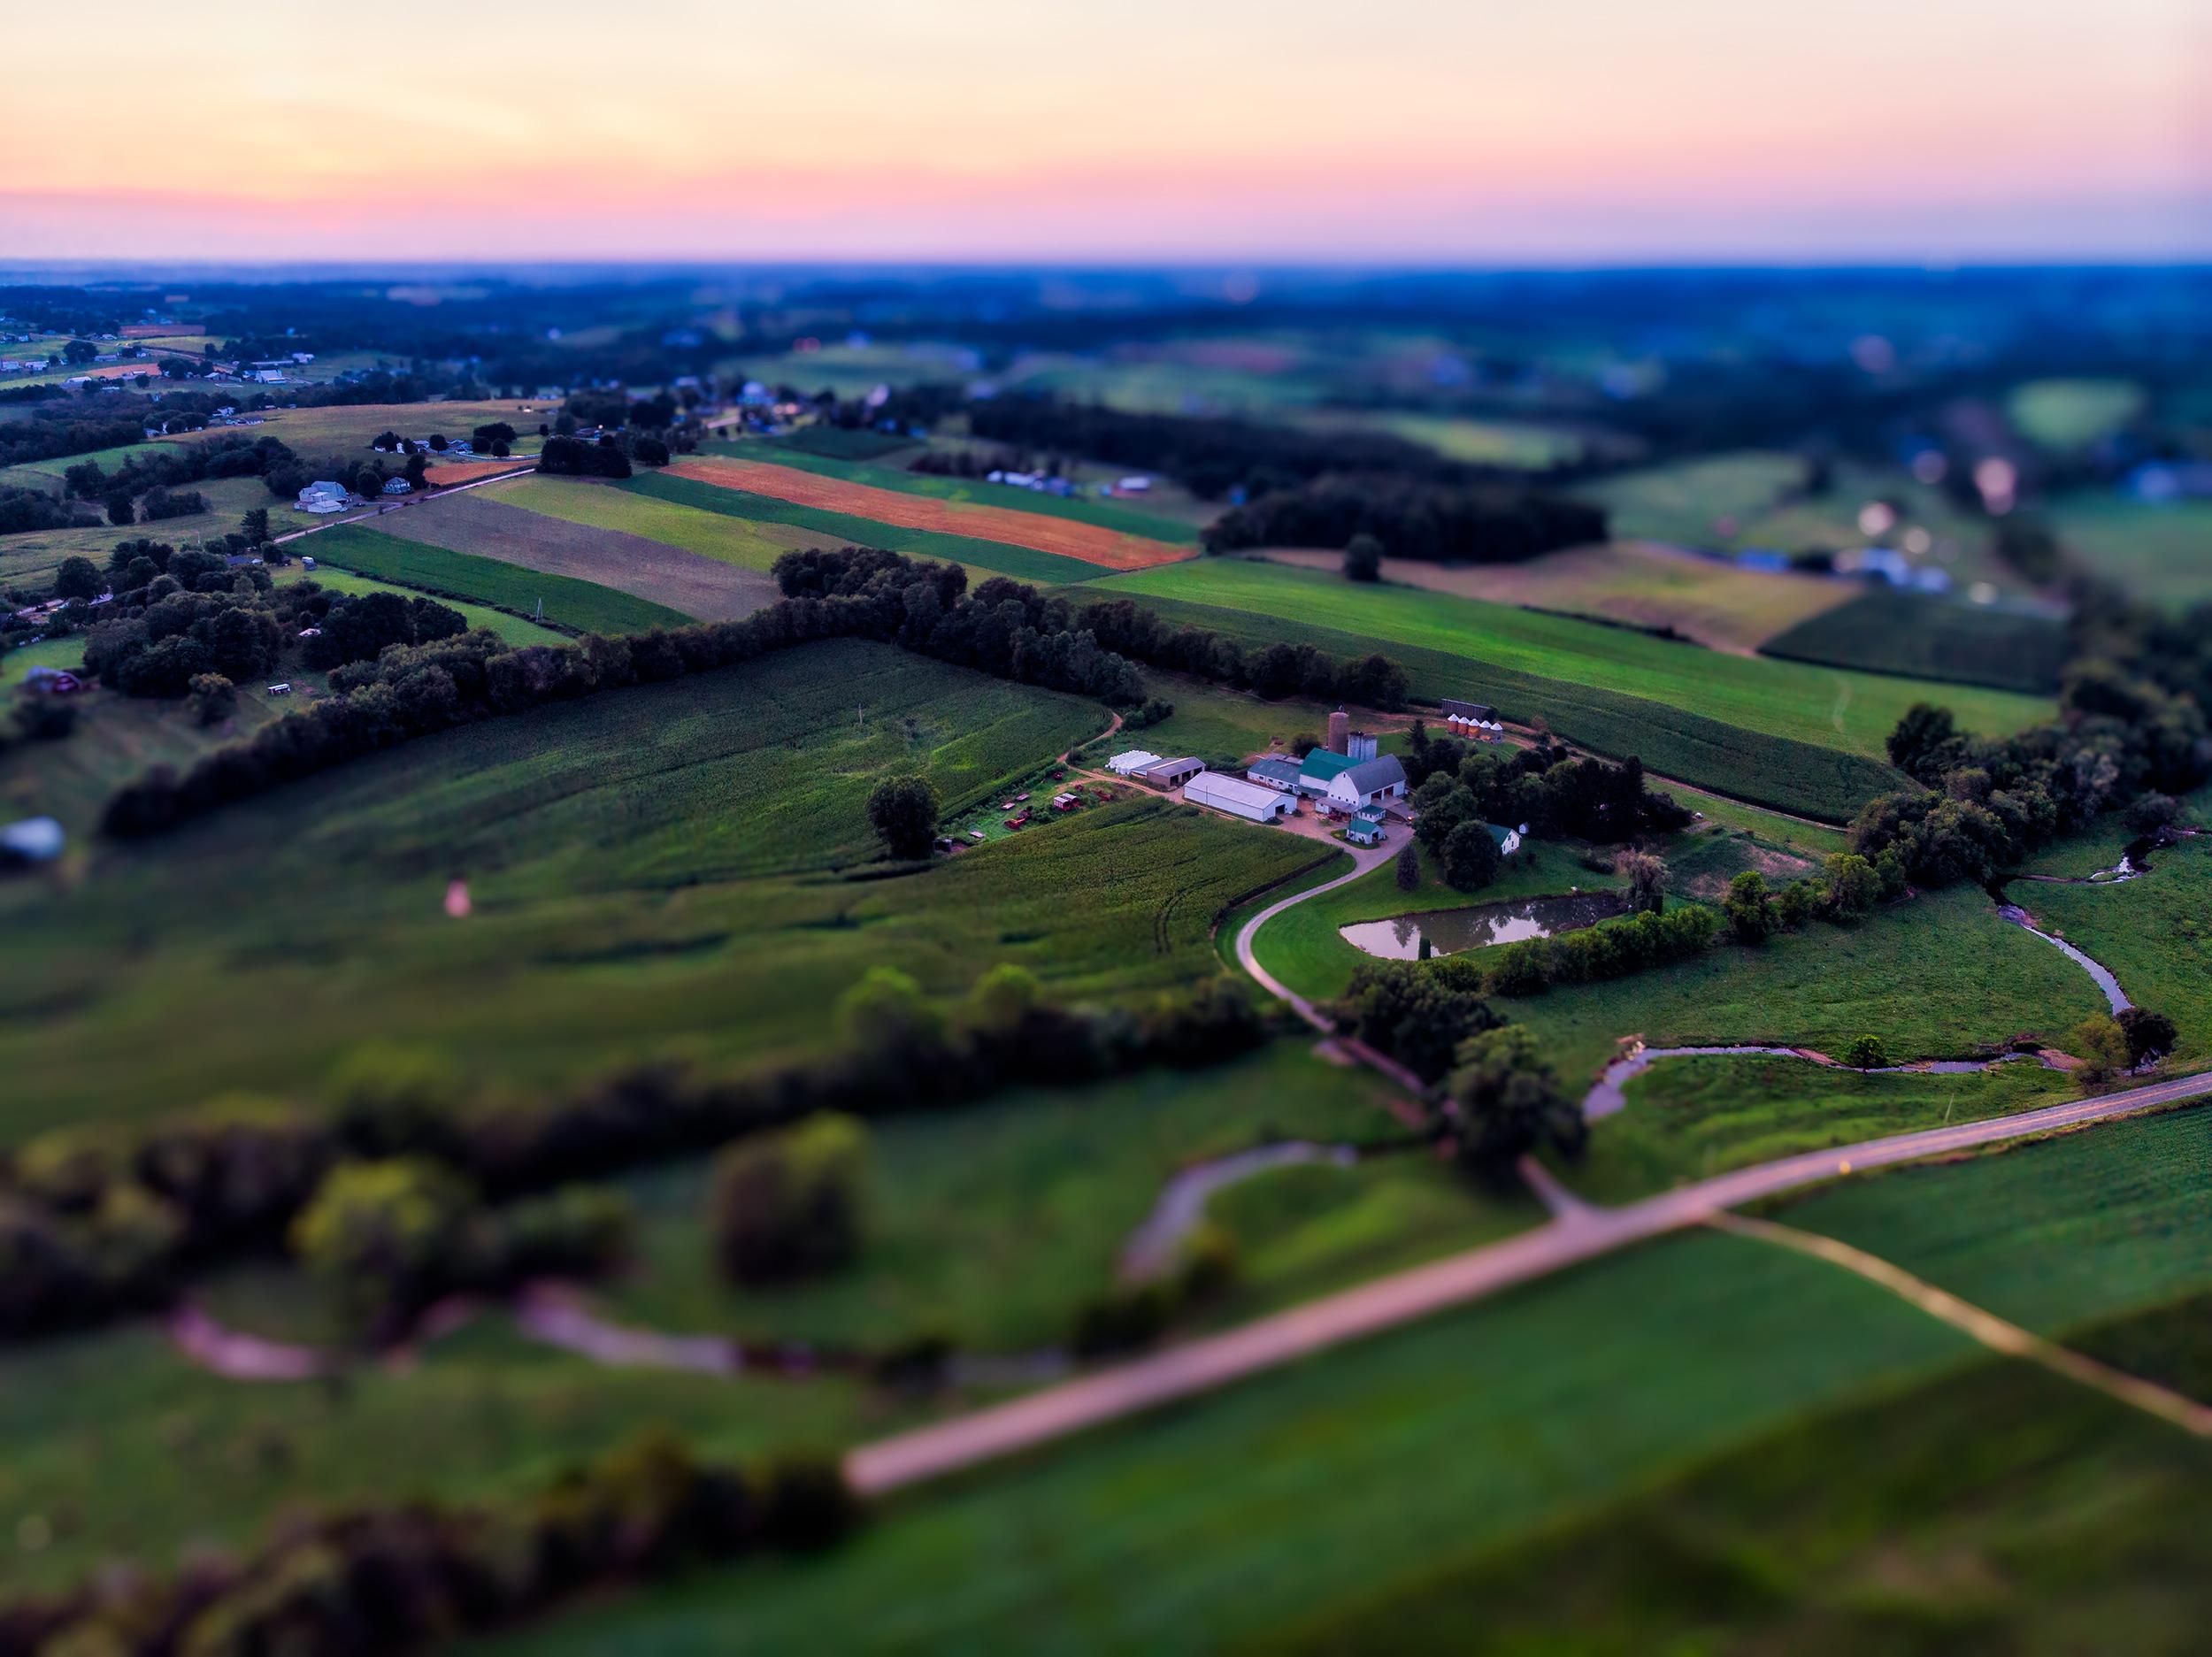 20180804-Aerial-Fredericksburg-0213_AuroraHDR2018-edit-Edit-Edit.jpg